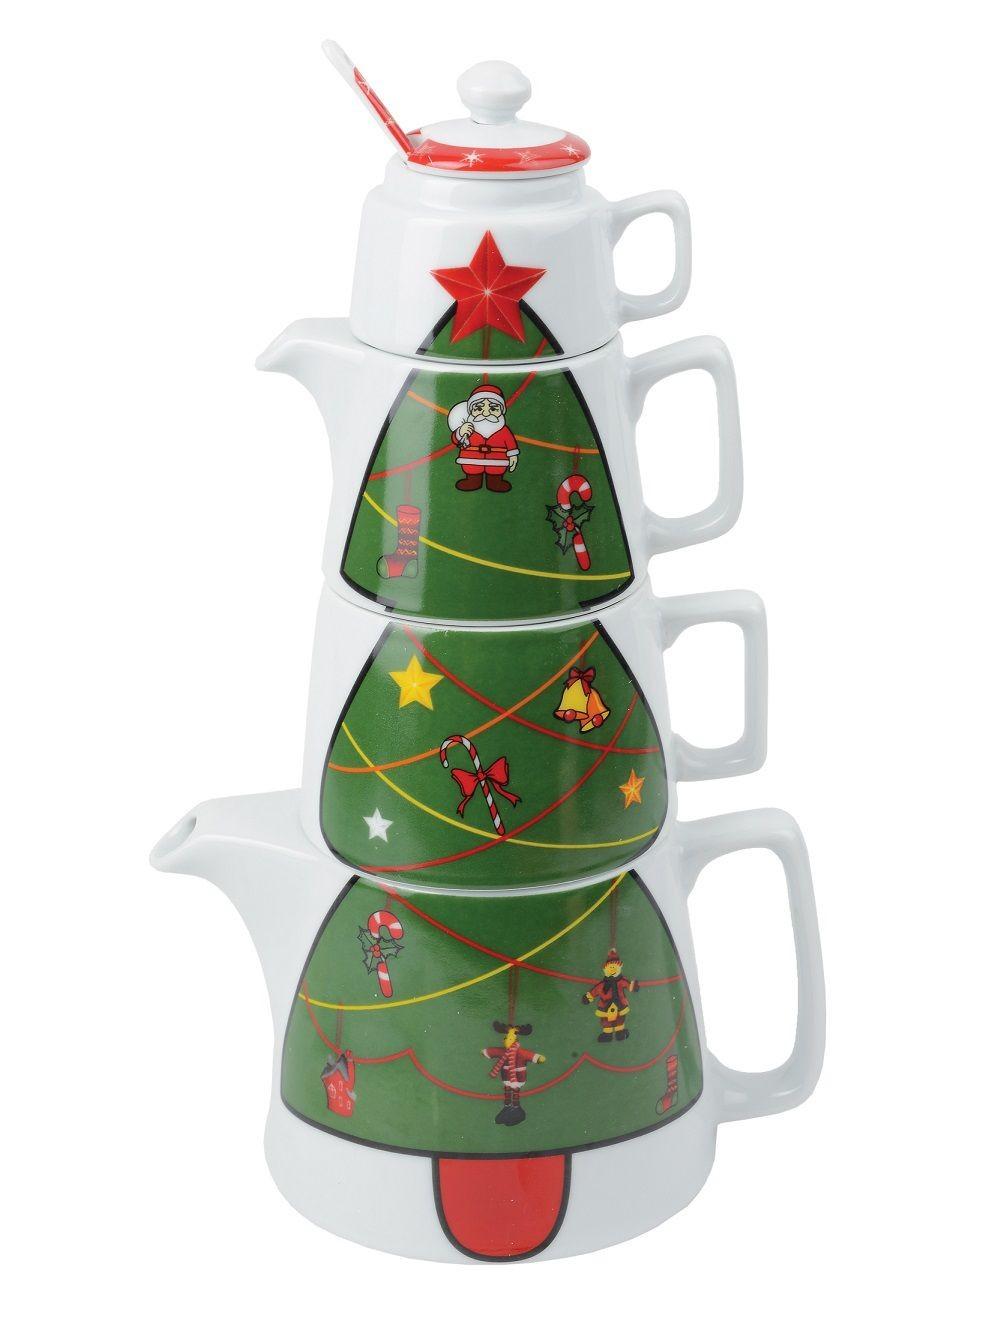 Набор для чаепития Новогодний